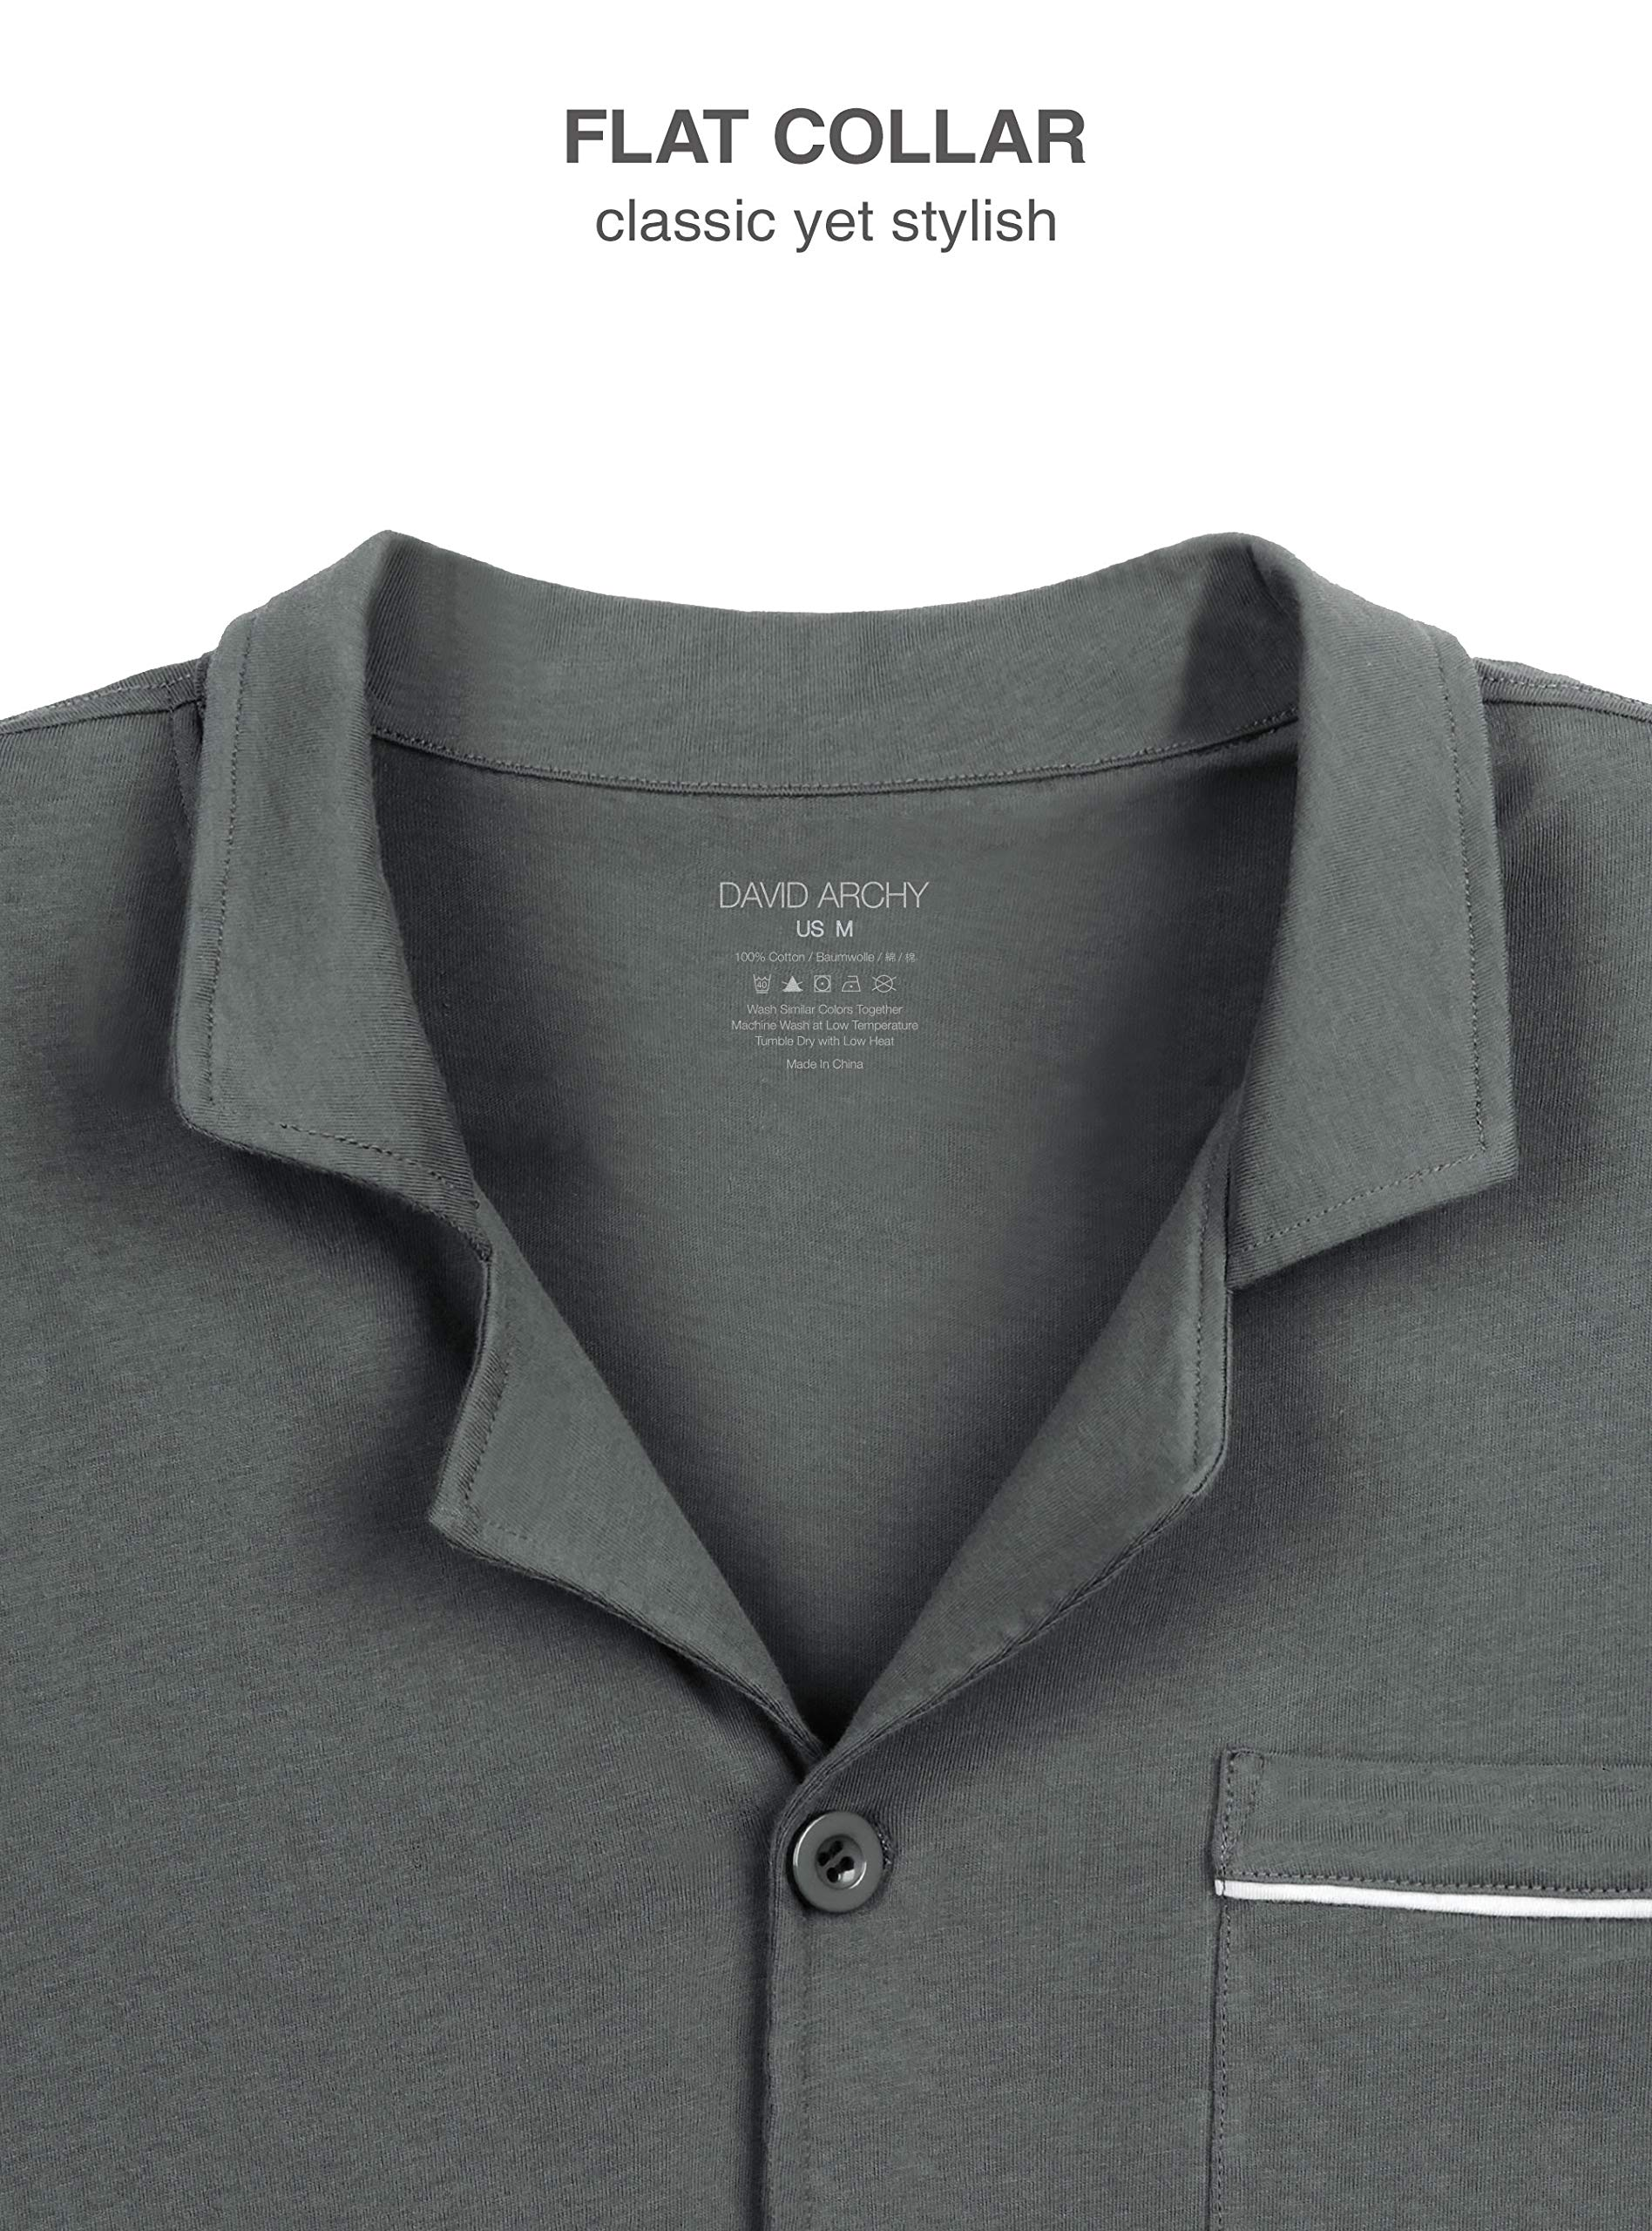 David Archy Men's 100% Cotton Long Button-Down Sleepwear Pajama Set (M, Dark Gray) by David Archy (Image #4)